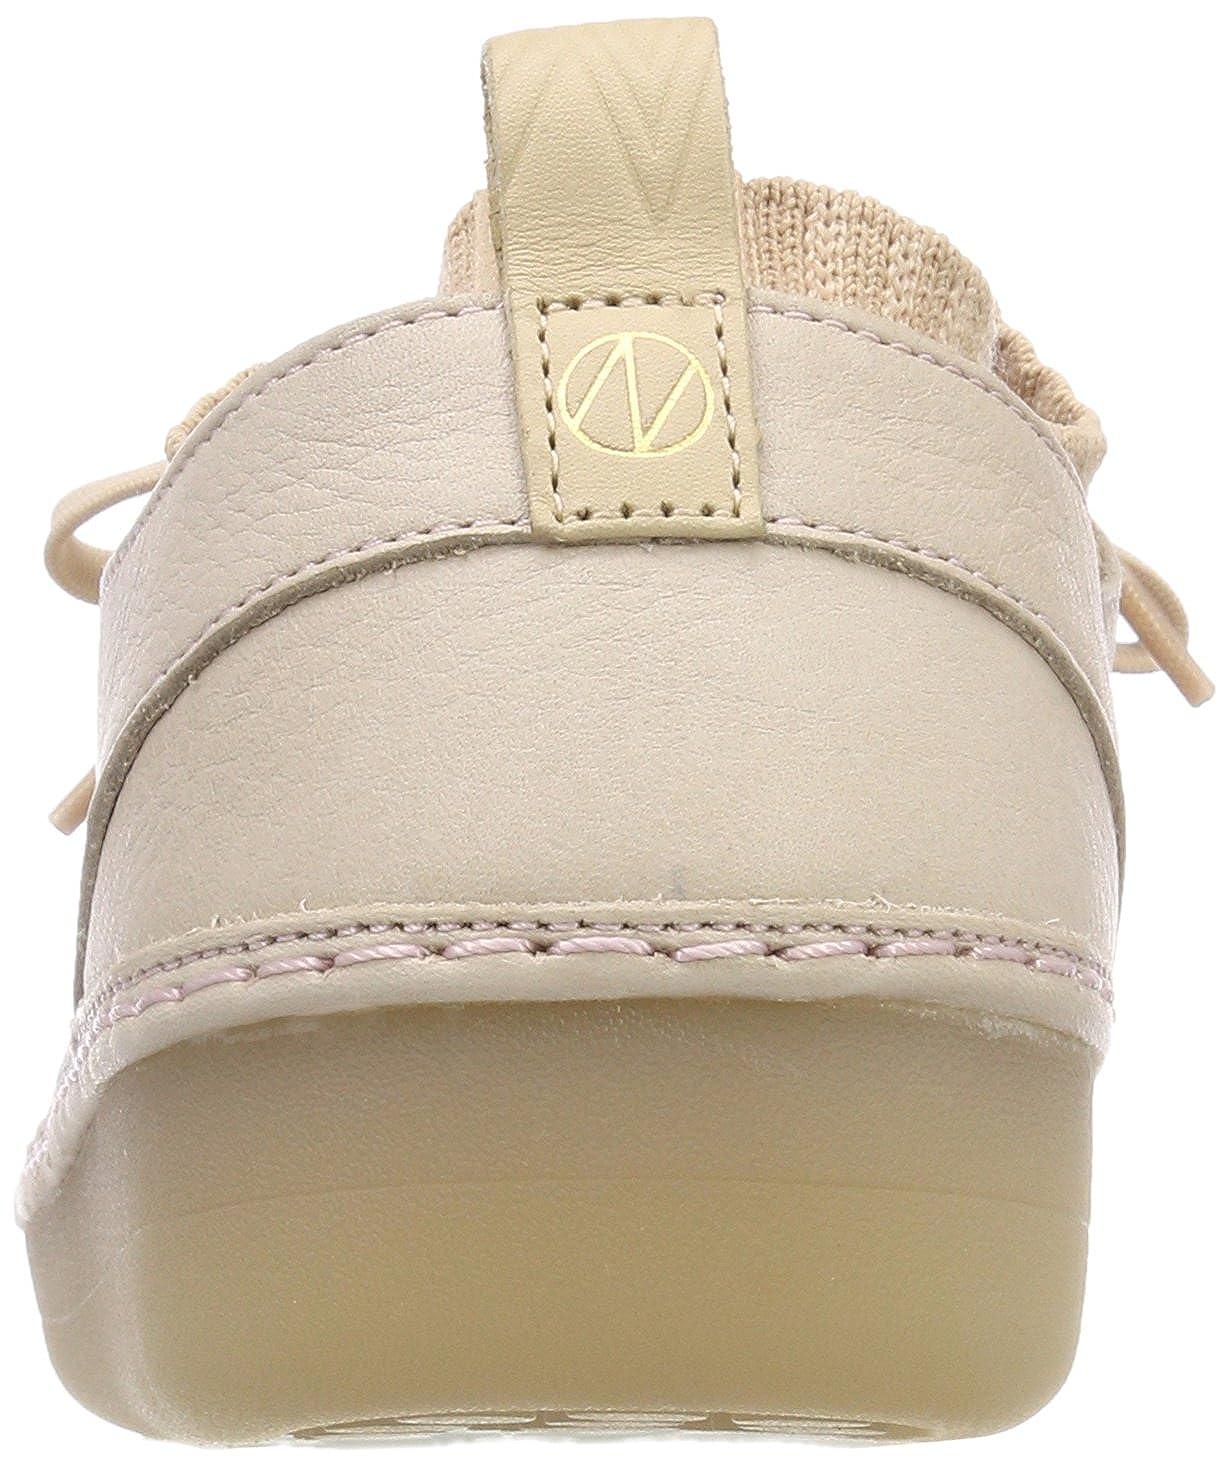 Clarks Pink Damen Nature Iv. Sneaker Pink Clarks (Nude Pink Lea) 5b85b0